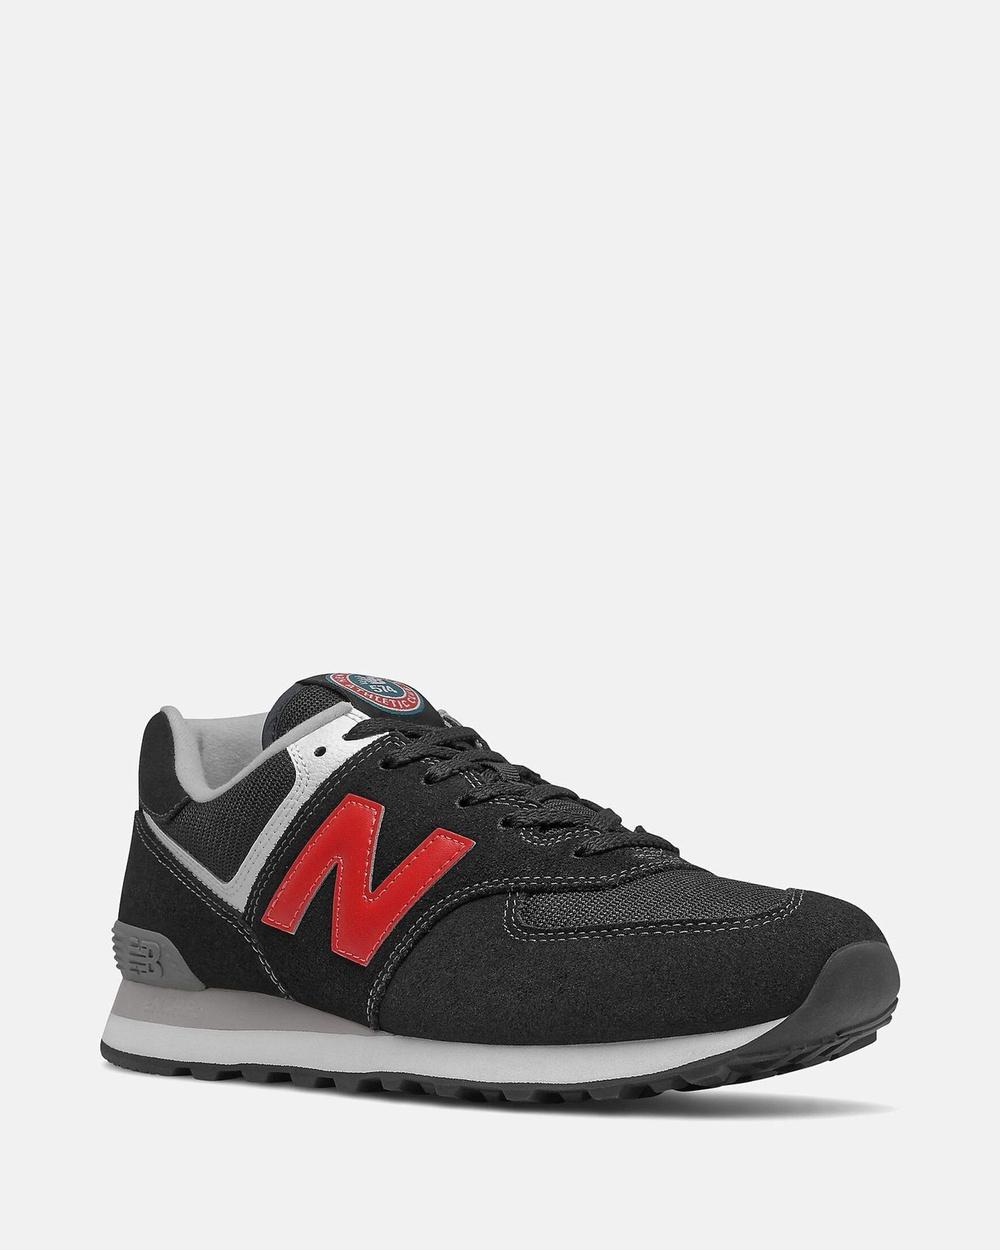 New Balance 574 Standard Fit Men's Performance Shoes Black Australia